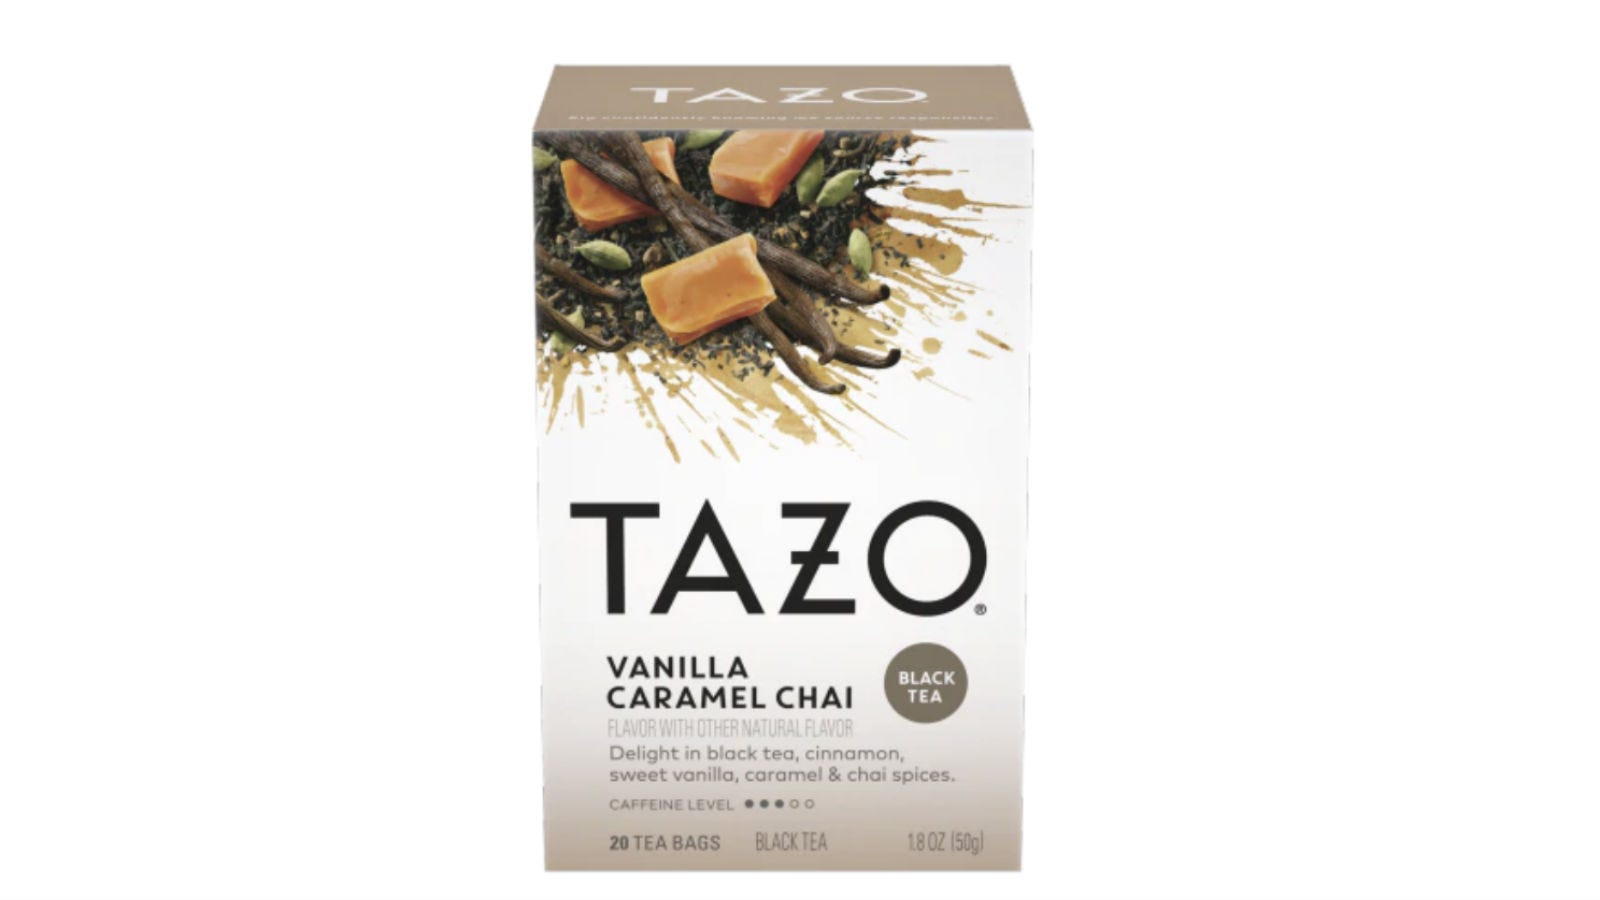 A box of Tazo Vanilla Caramel Chai Tea.